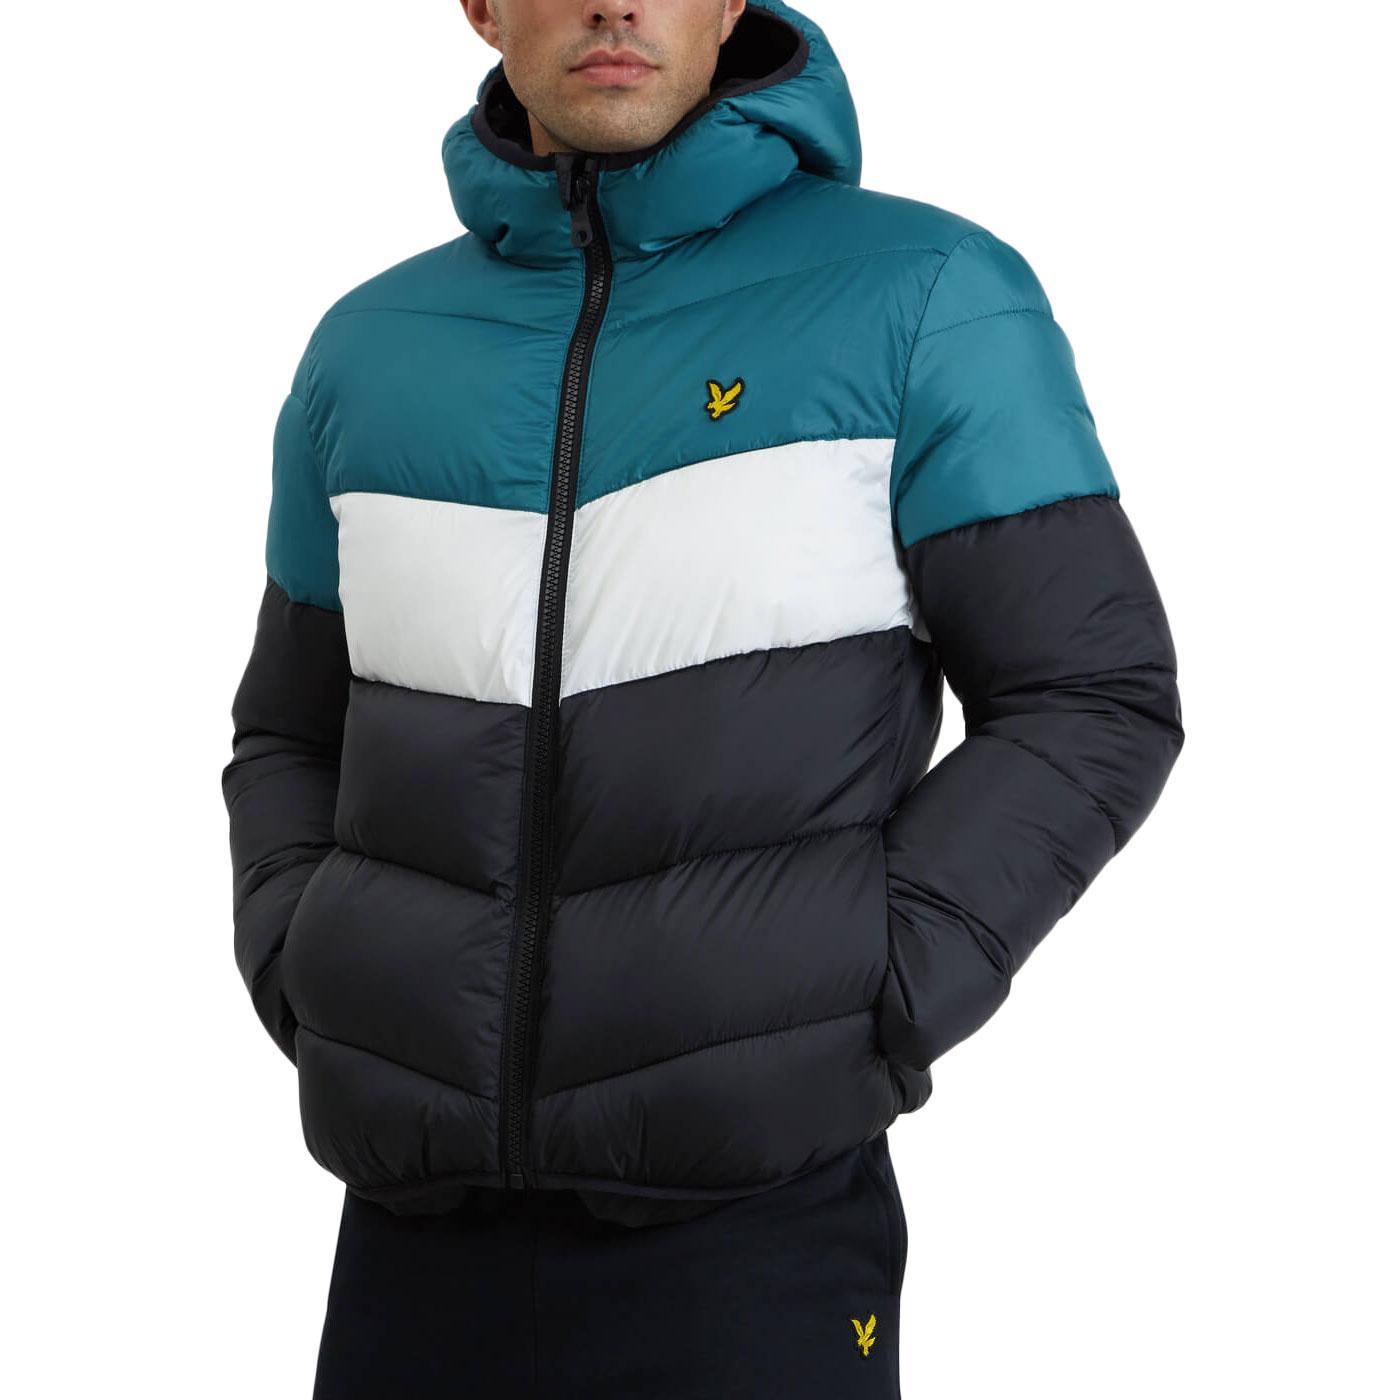 LYLE & SCOTT Retro Colour Block Puffa Jacket (TB)